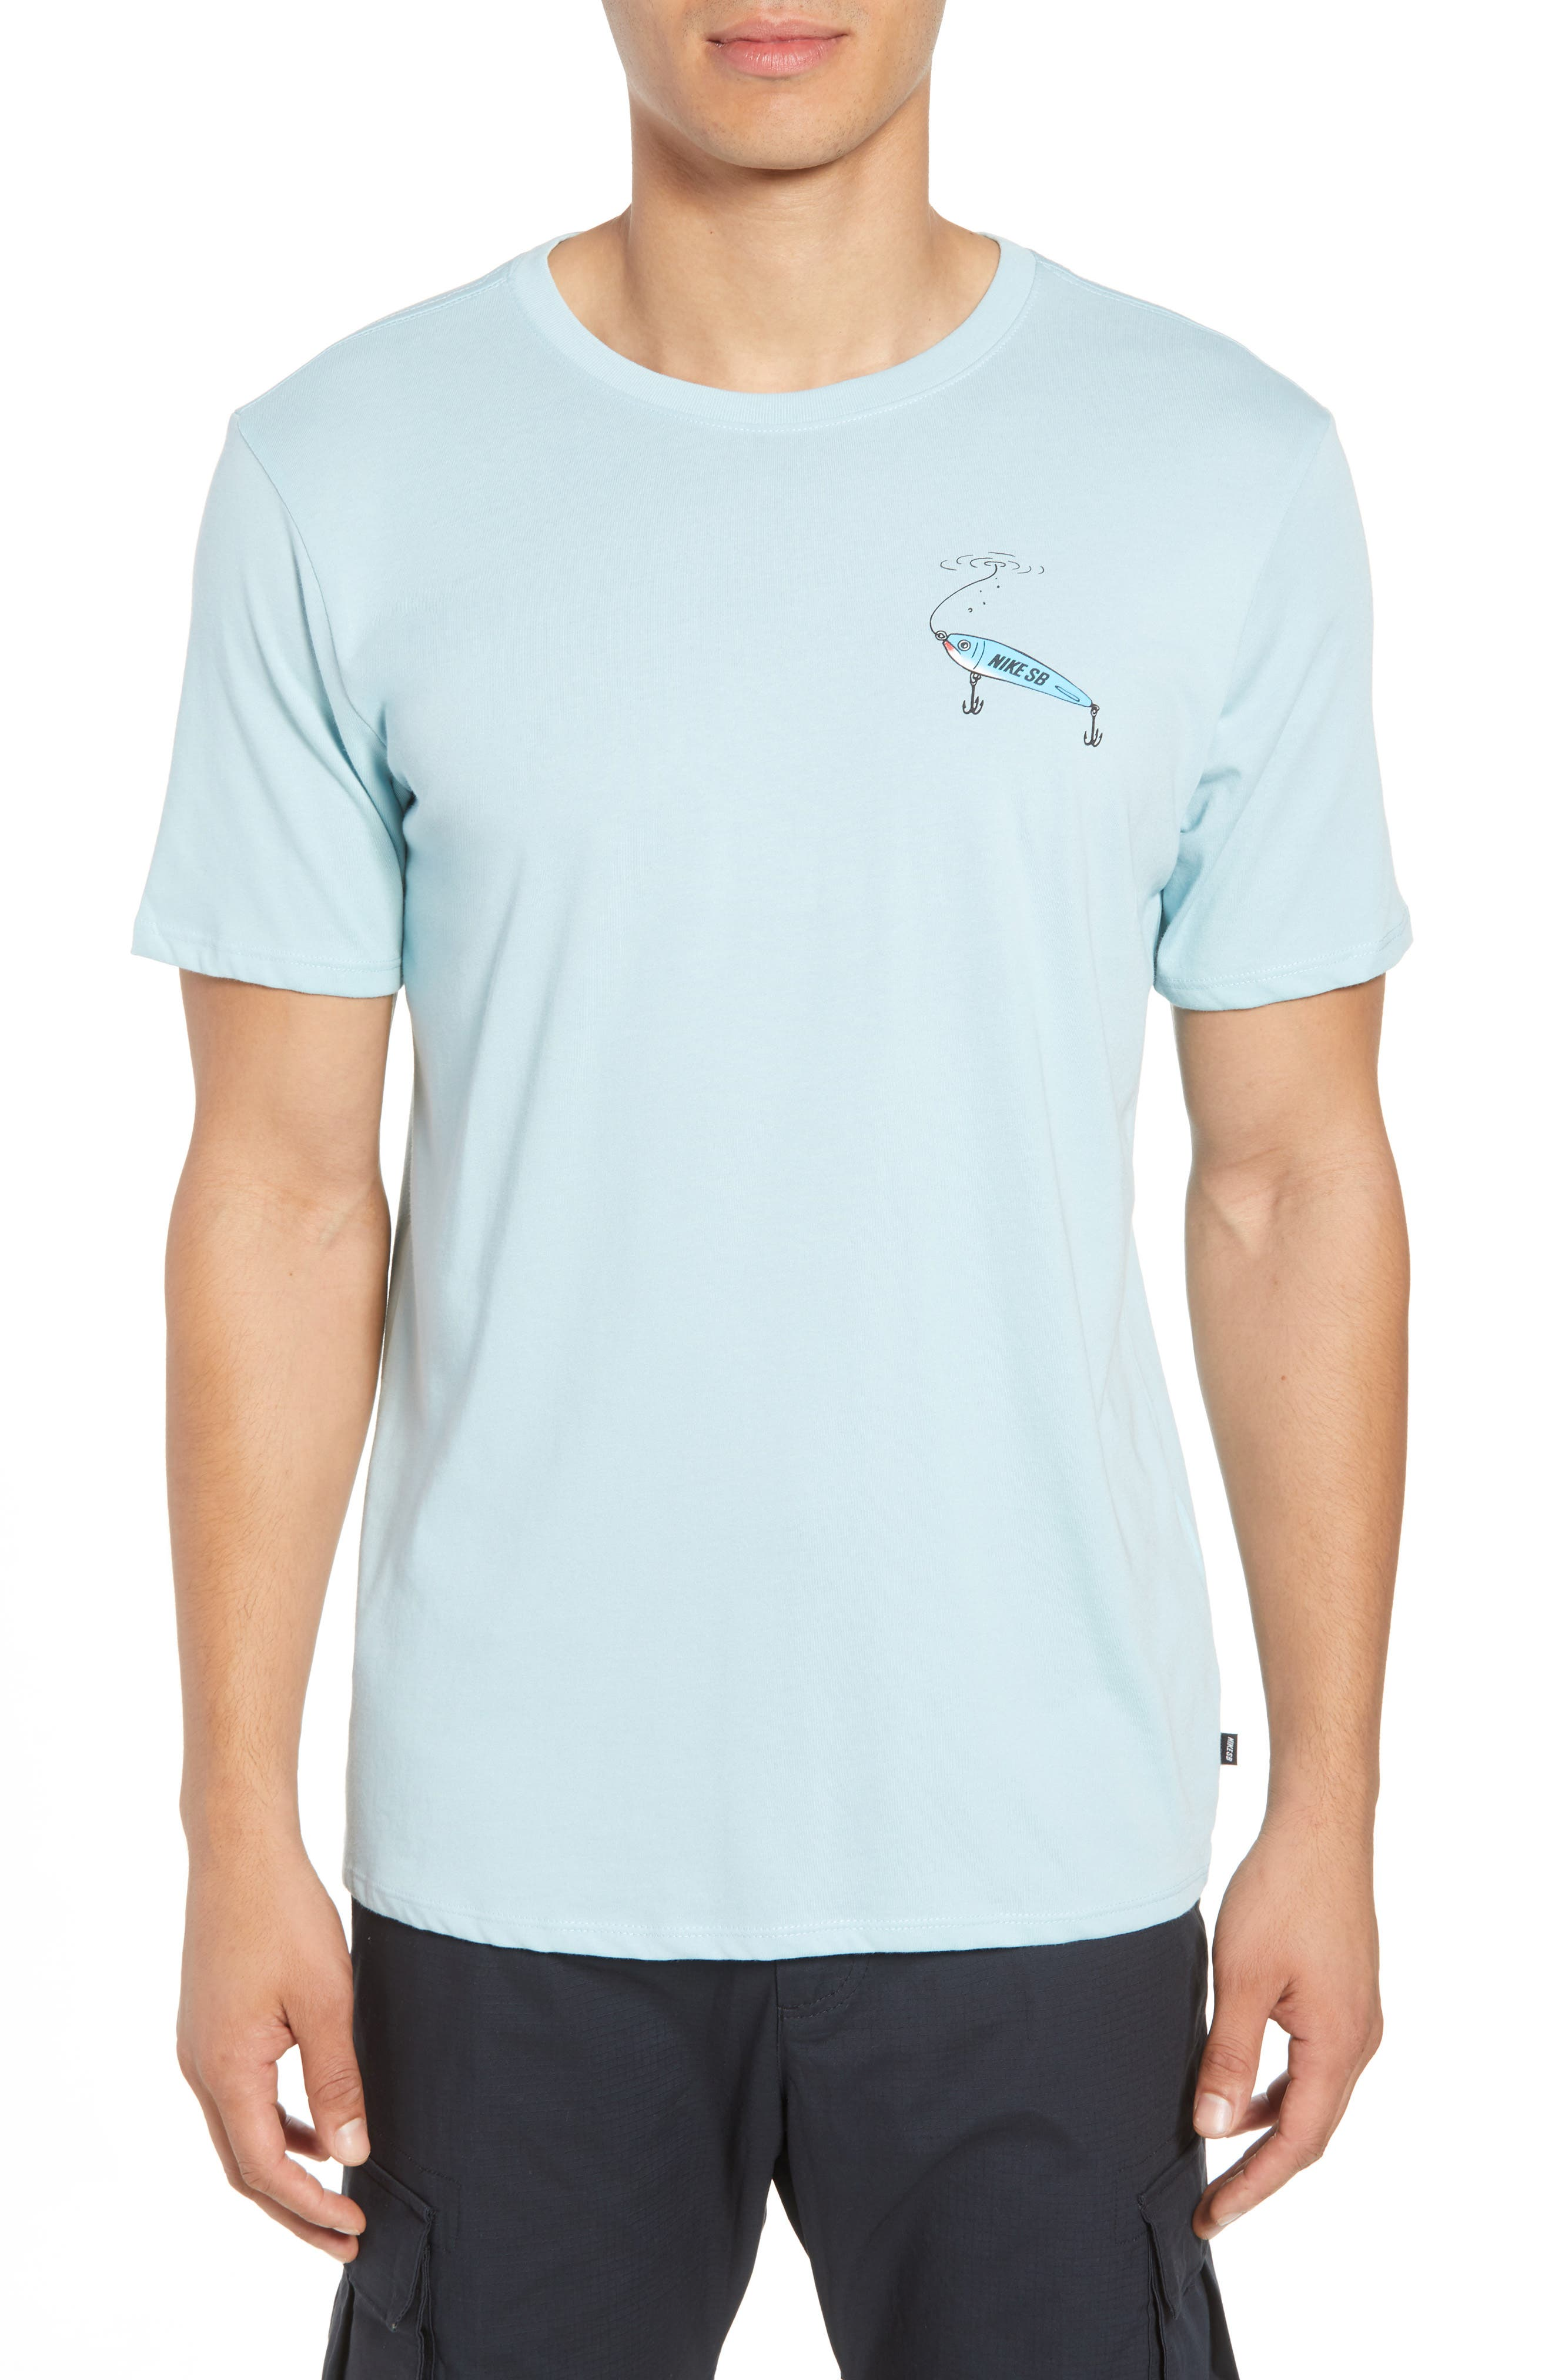 Dry Walrus T-Shirt,                         Main,                         color, Ocean Bliss/ Black